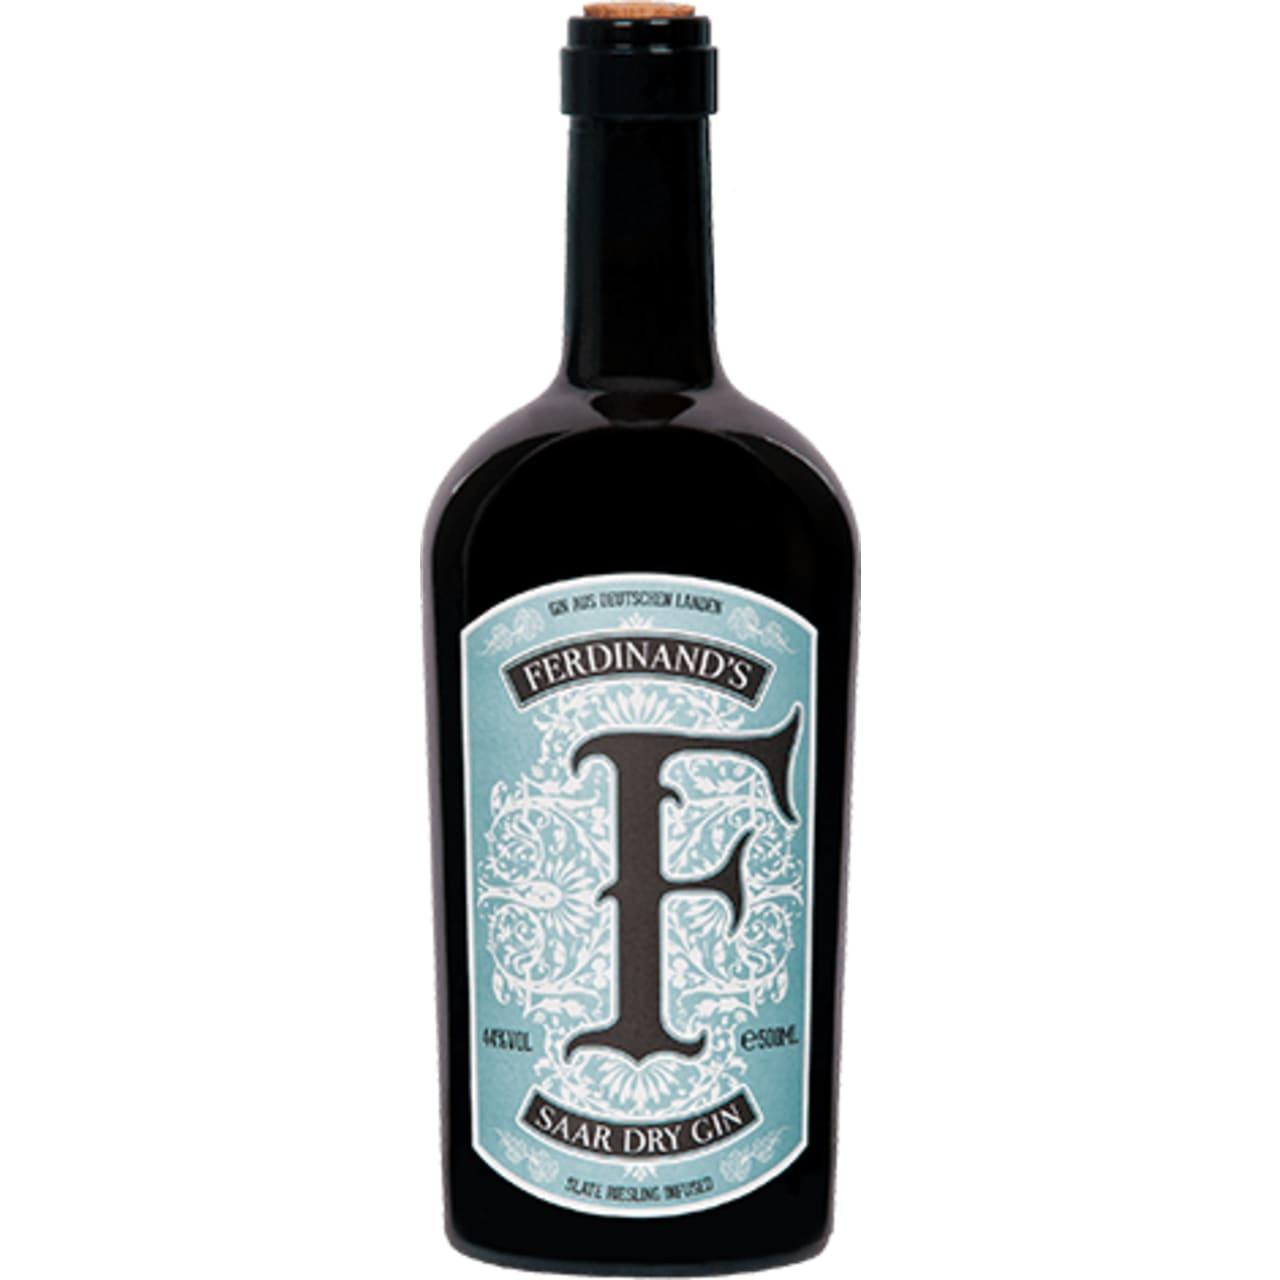 Product Image - Ferdinand's Saar Dry Gin